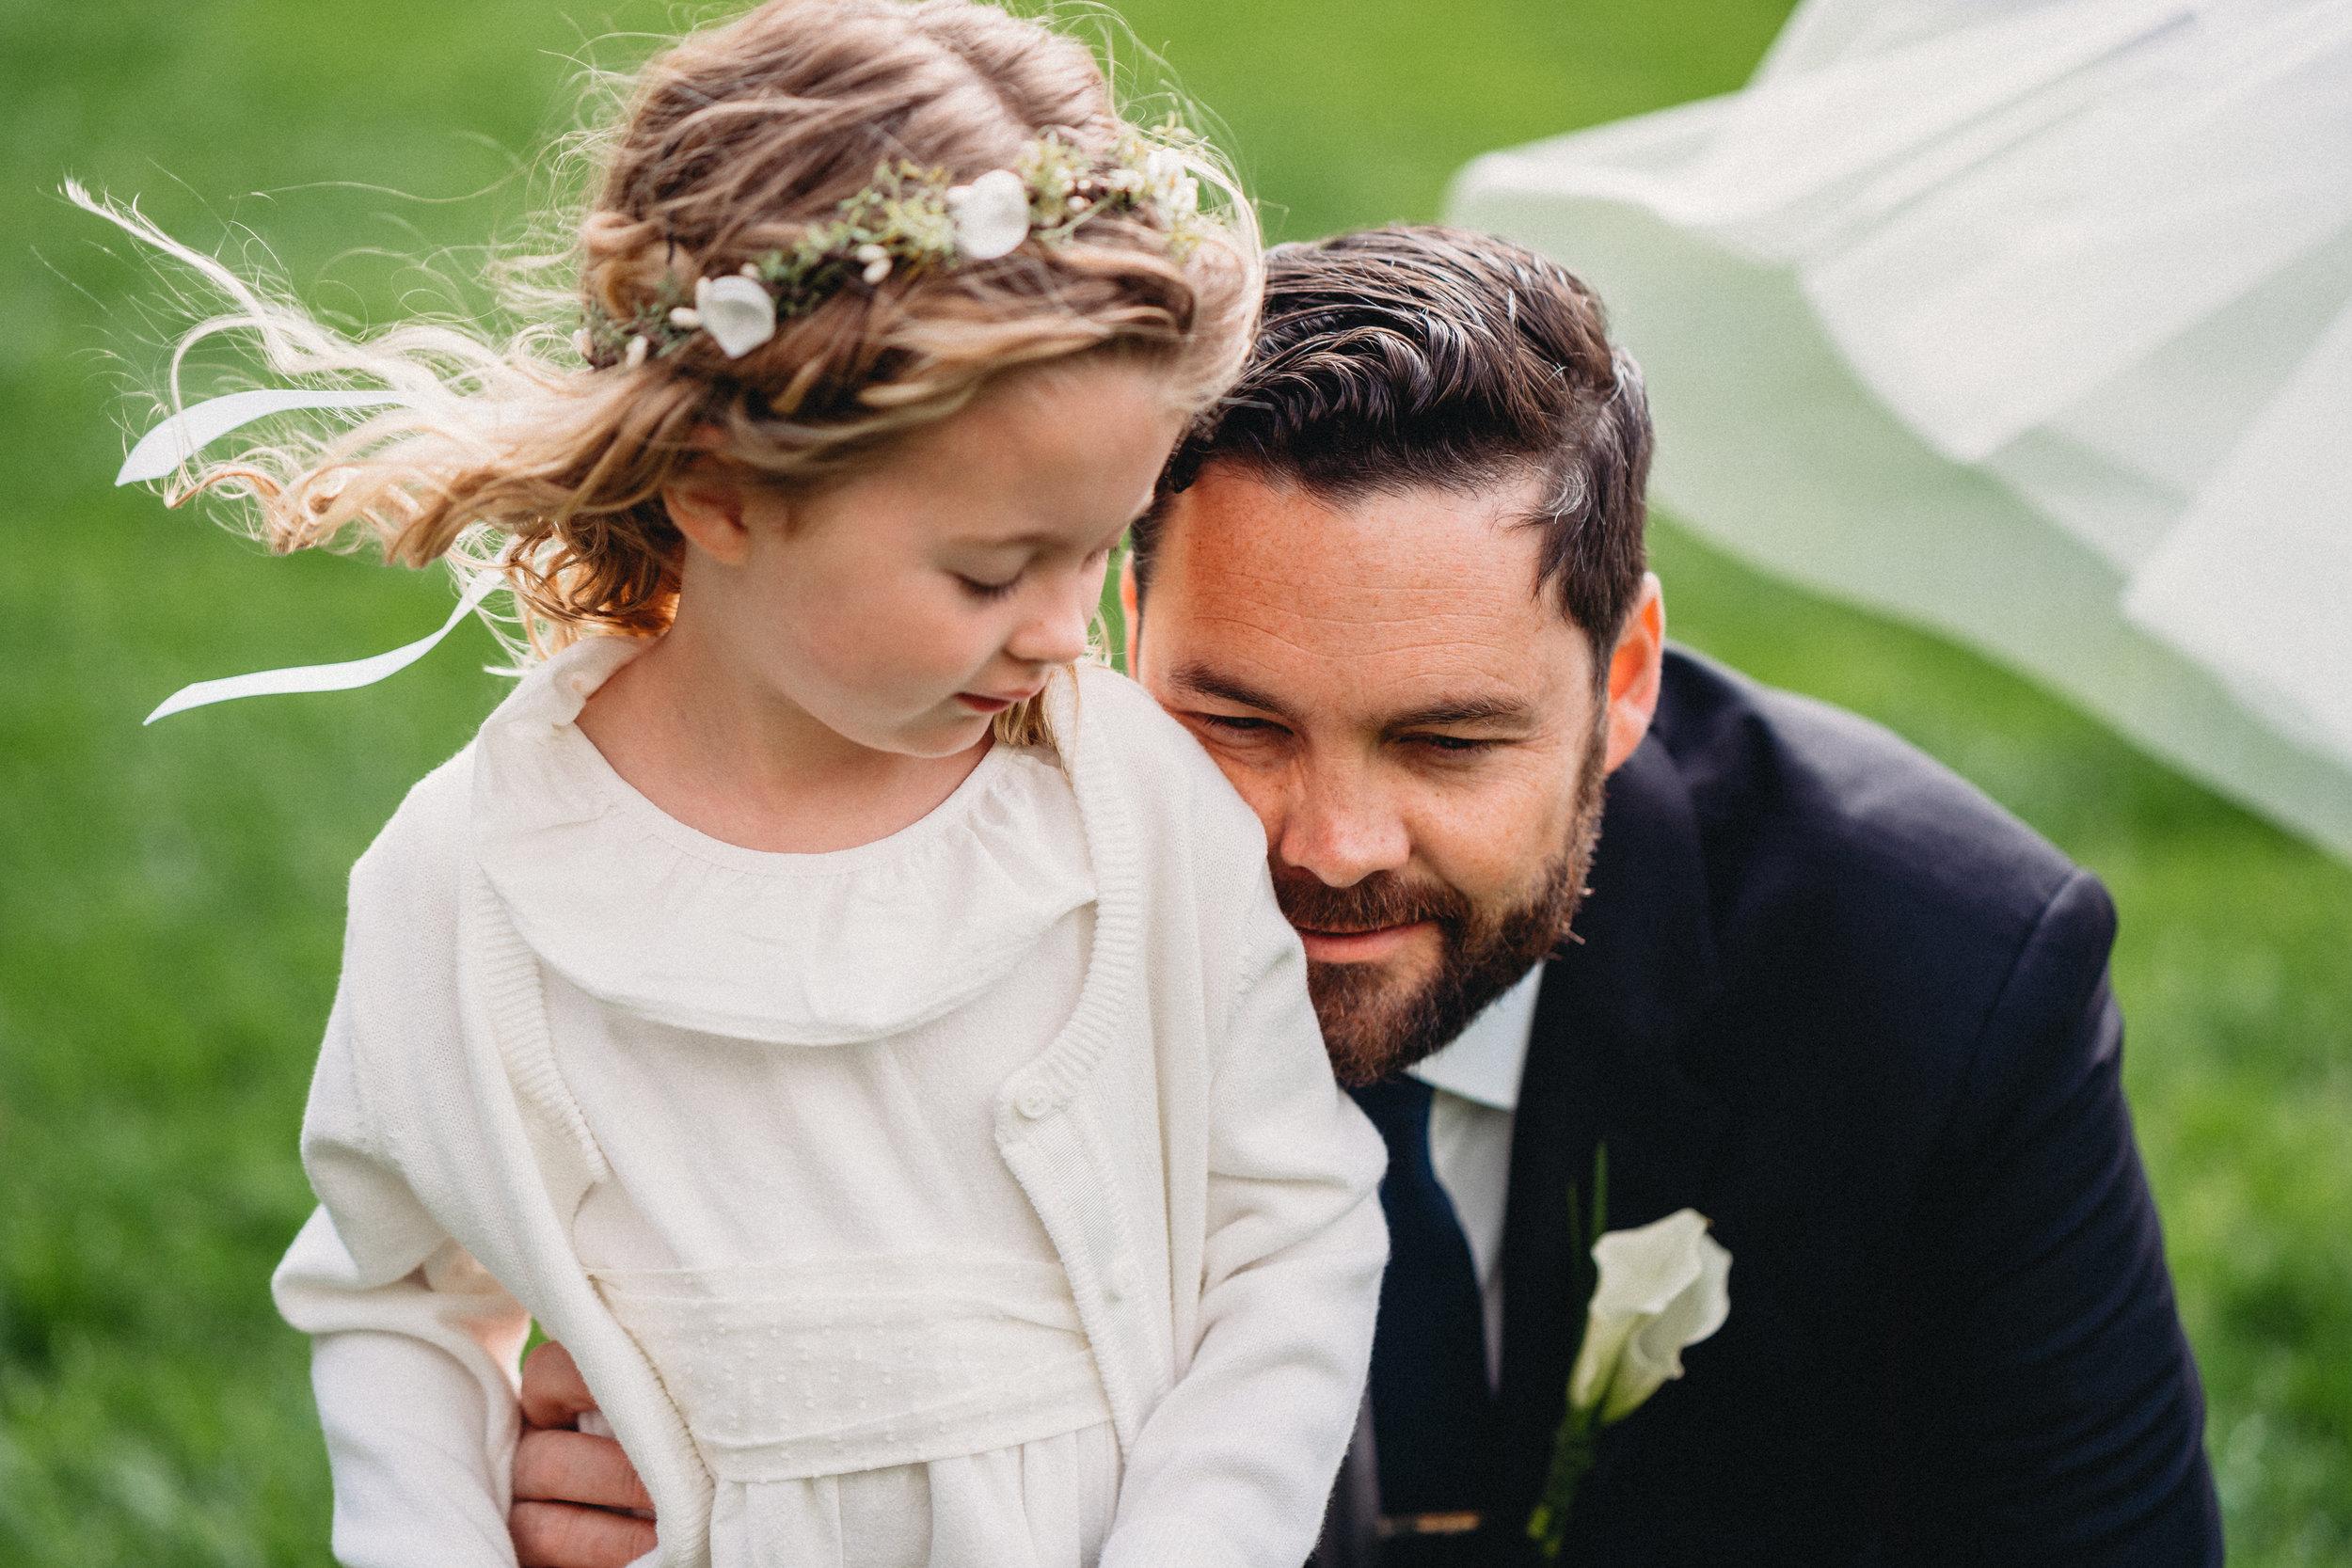 wedding-photography-santa-barbara-courthouse-rebeccaylasotras-104.jpg